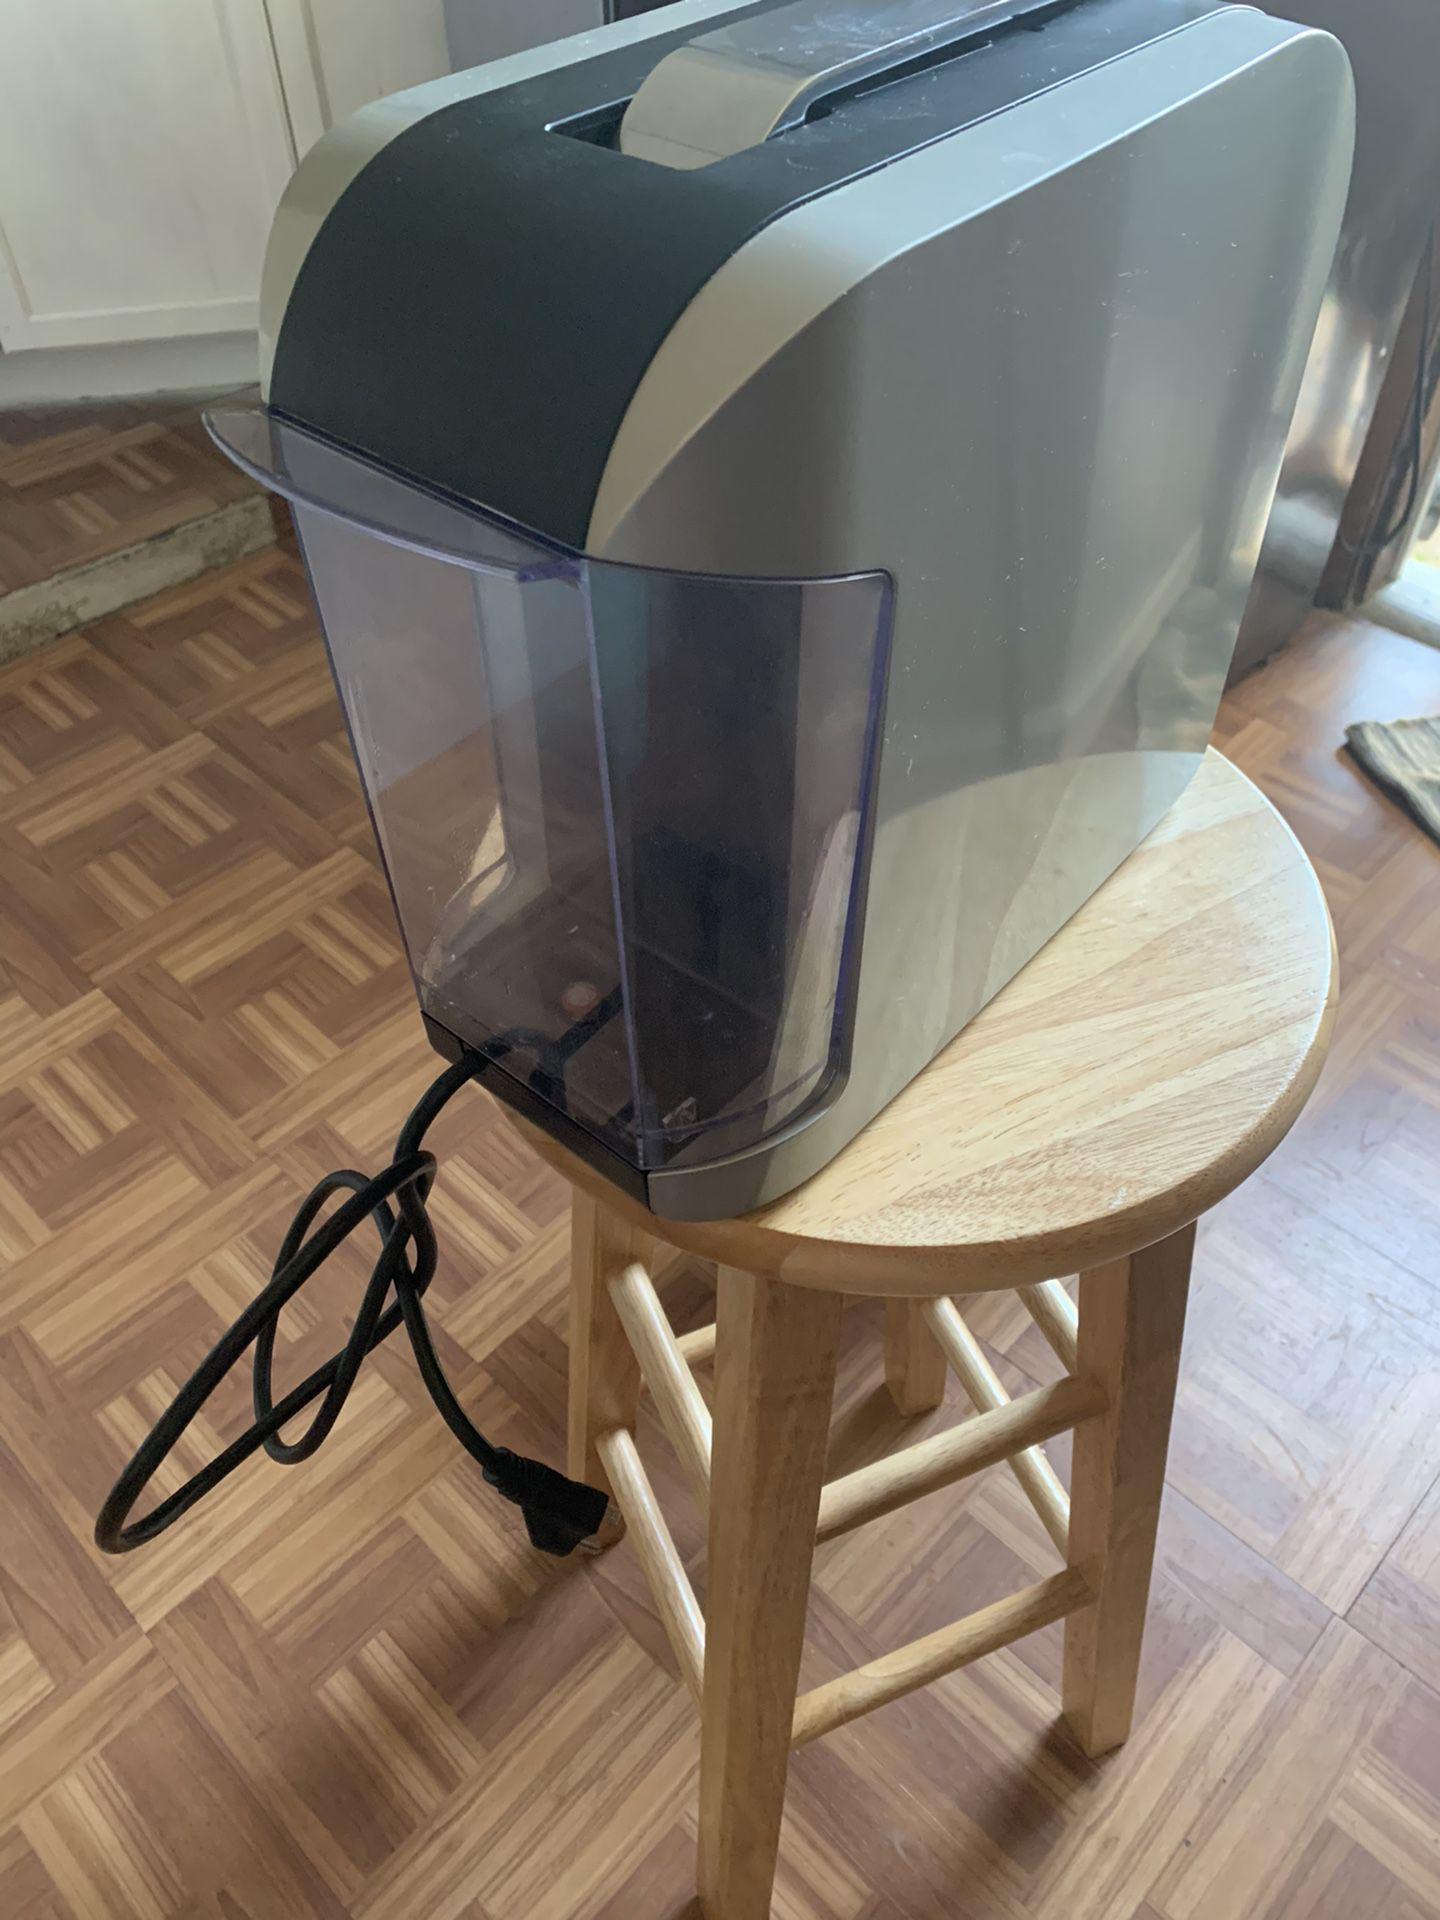 Verismo Starbucks K-Fee 11 5P40 Coffee Maker & Espresso Pod Machine